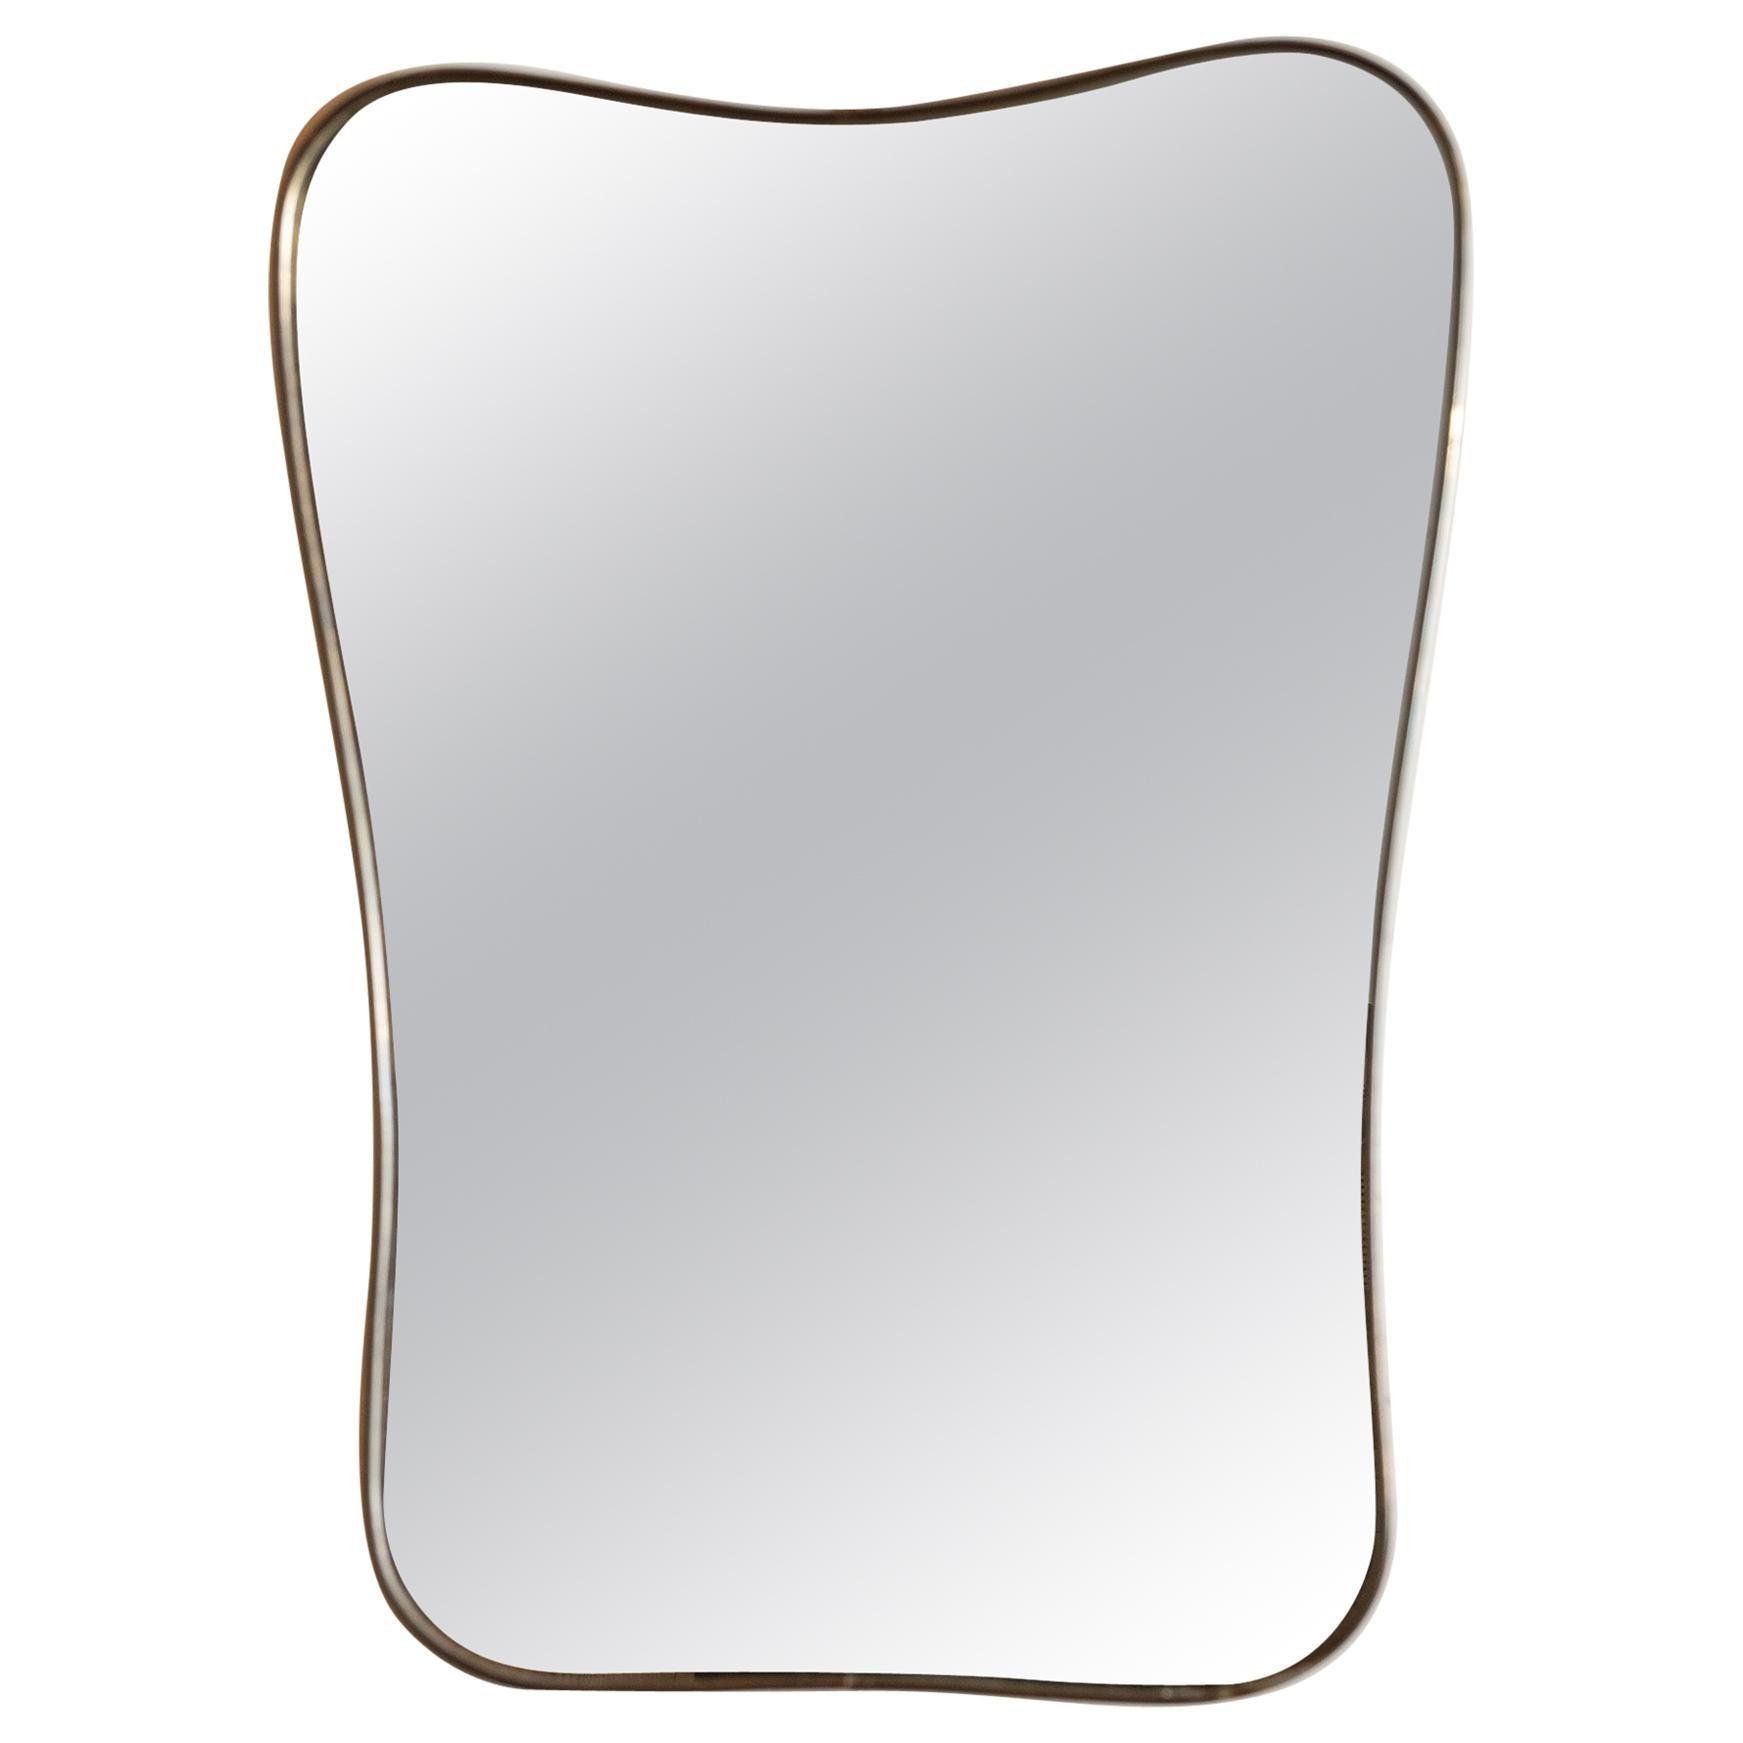 Medium Italian Brass Mirror with Lovely Patina, 1950s